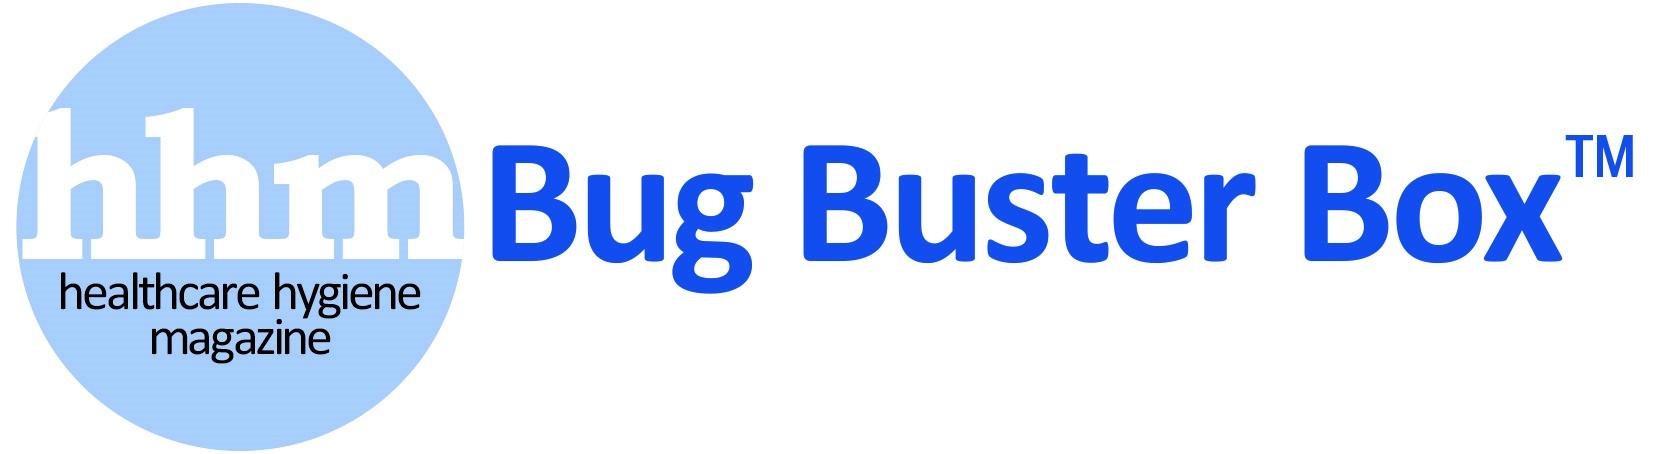 Bug Buster Box logo